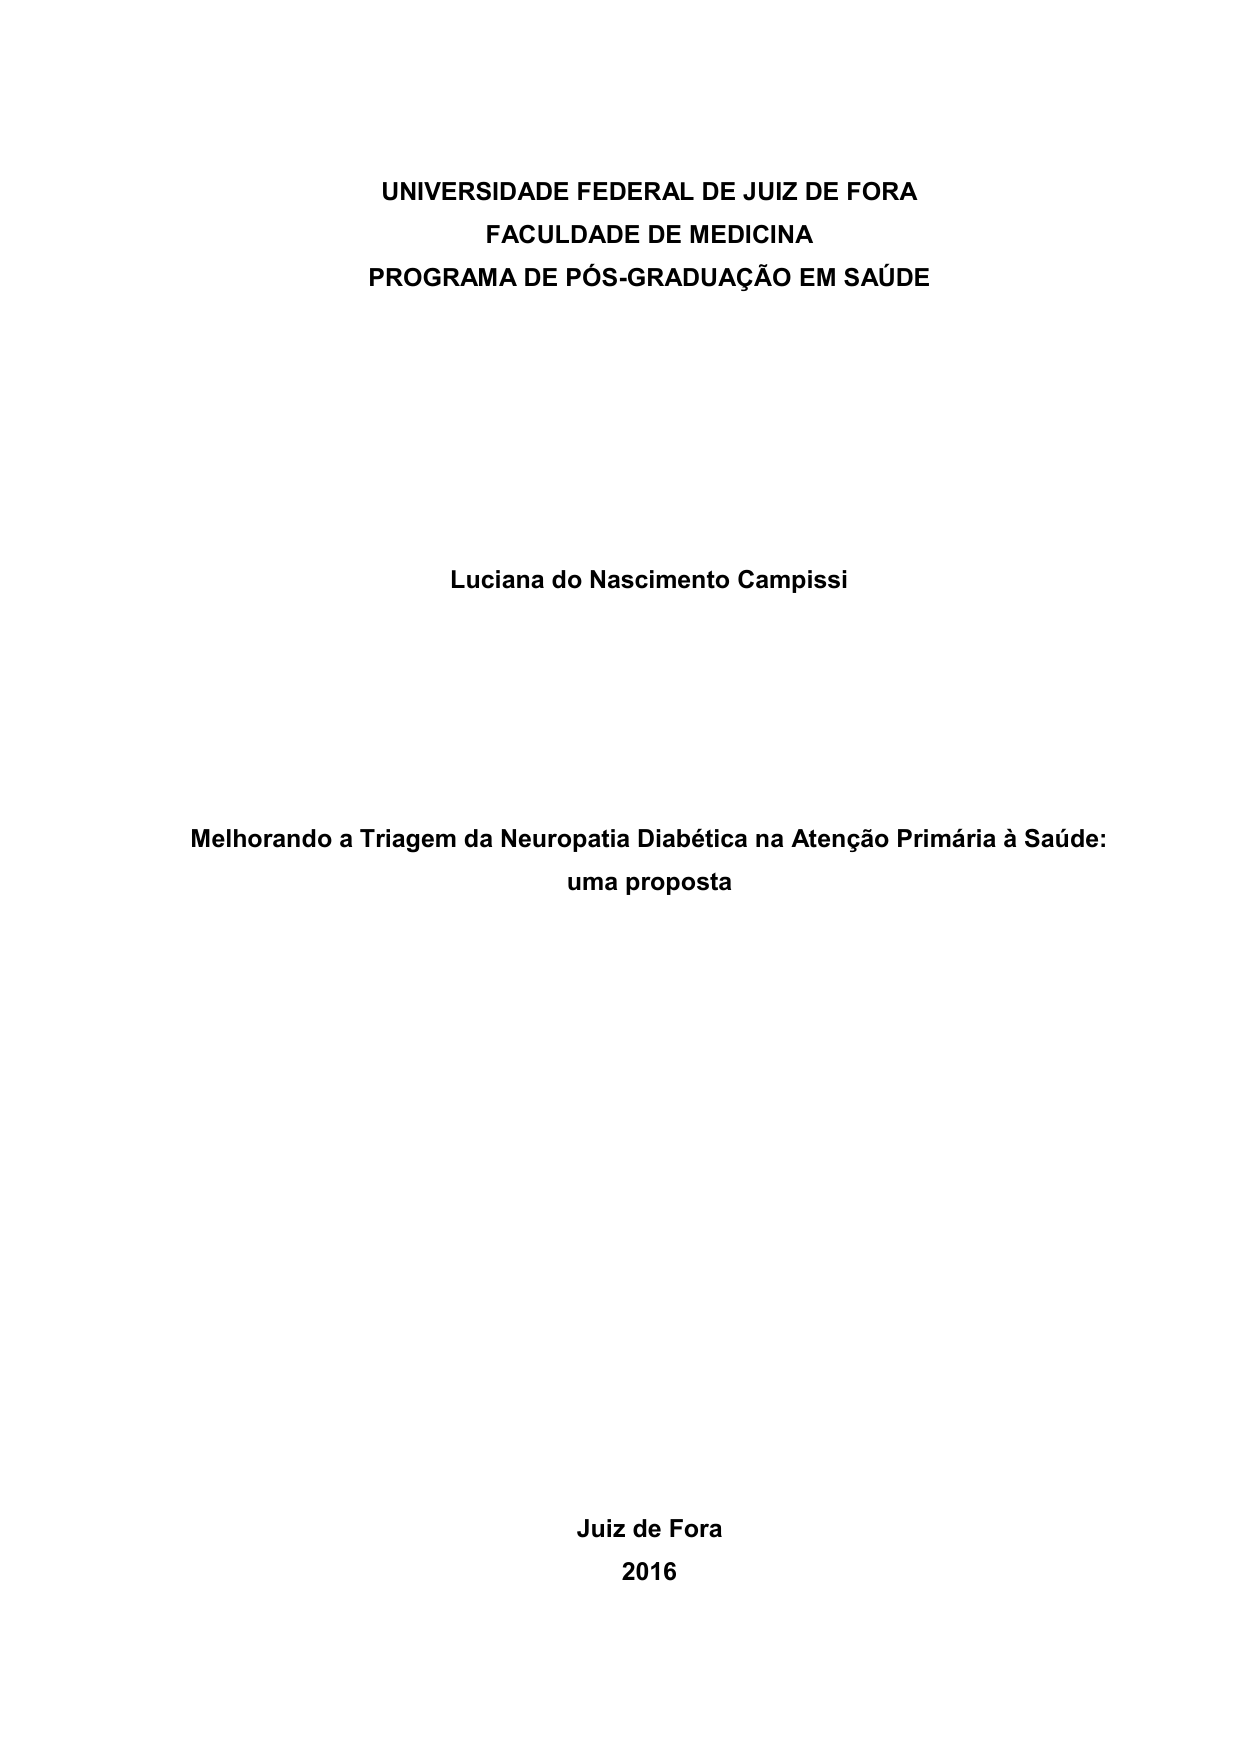 Diabética ou amiotrofia neuropatia proximal